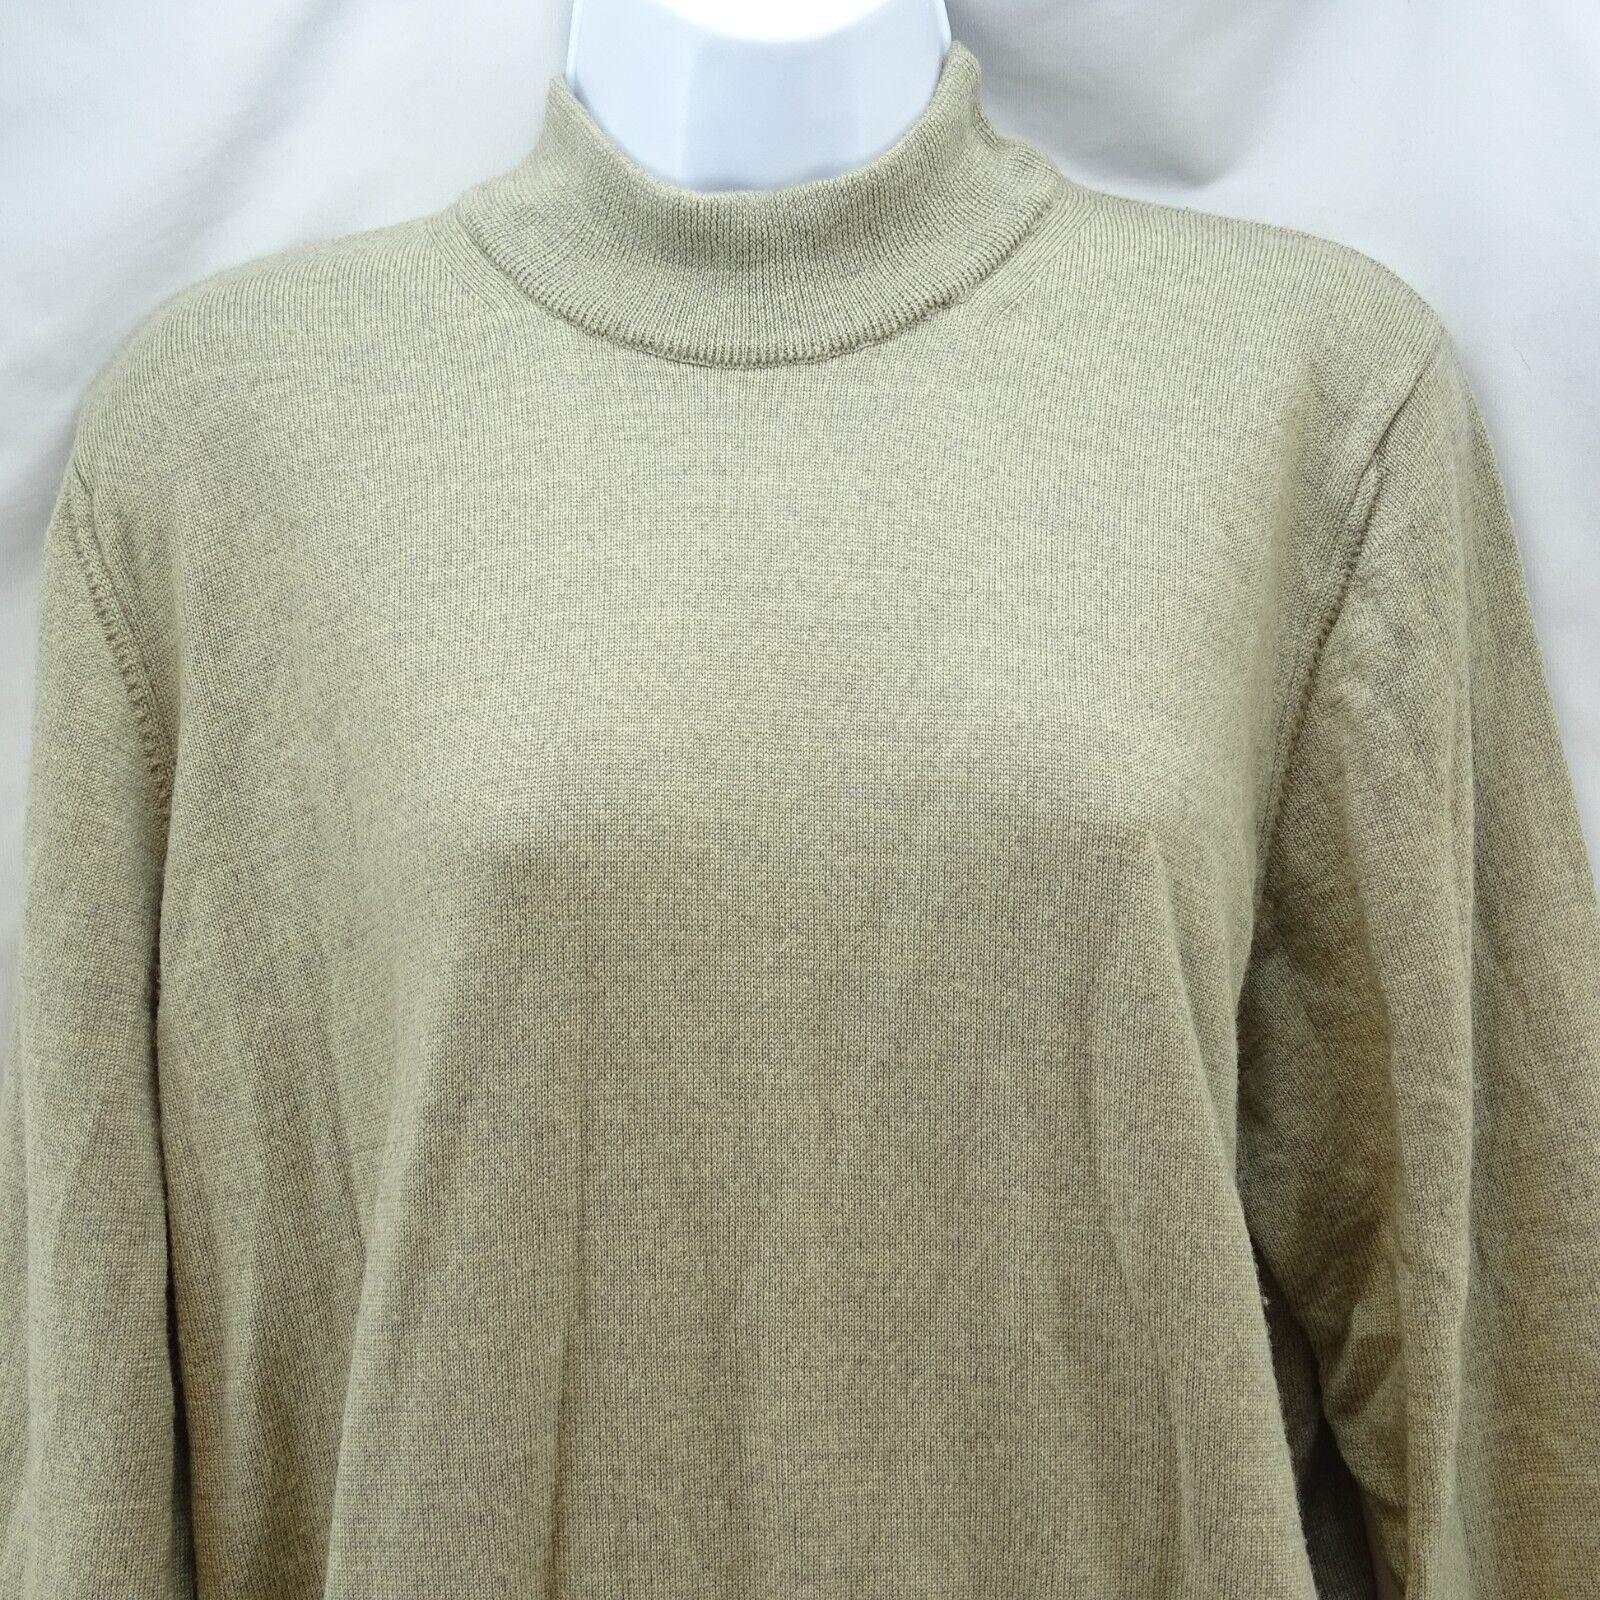 Women's Sweater Small Valda by Toscano Tan Merino Extra Fine Wool Pull Over